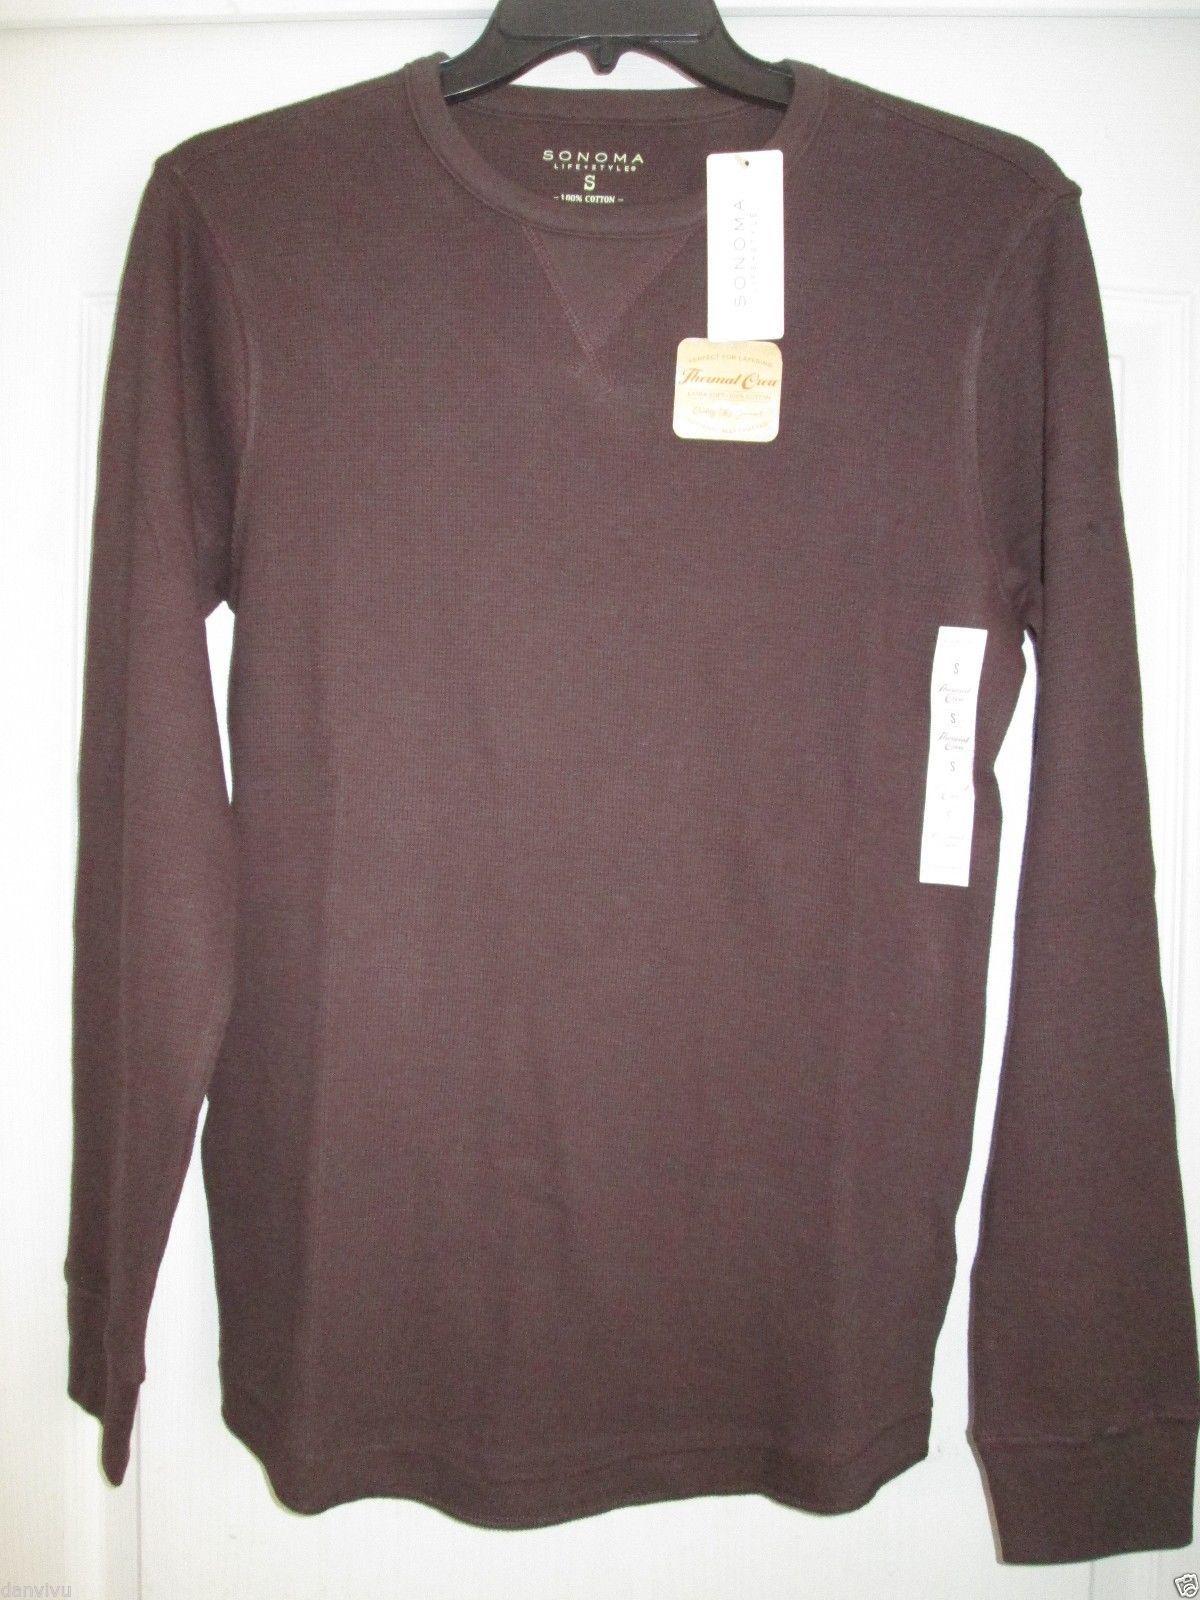 ed22361b0753 S l1600. S l1600. Previous. Sonoma Extra Soft Cotton LSLV Thermal Crewneck Men  T-Shirt Dark Brown ...